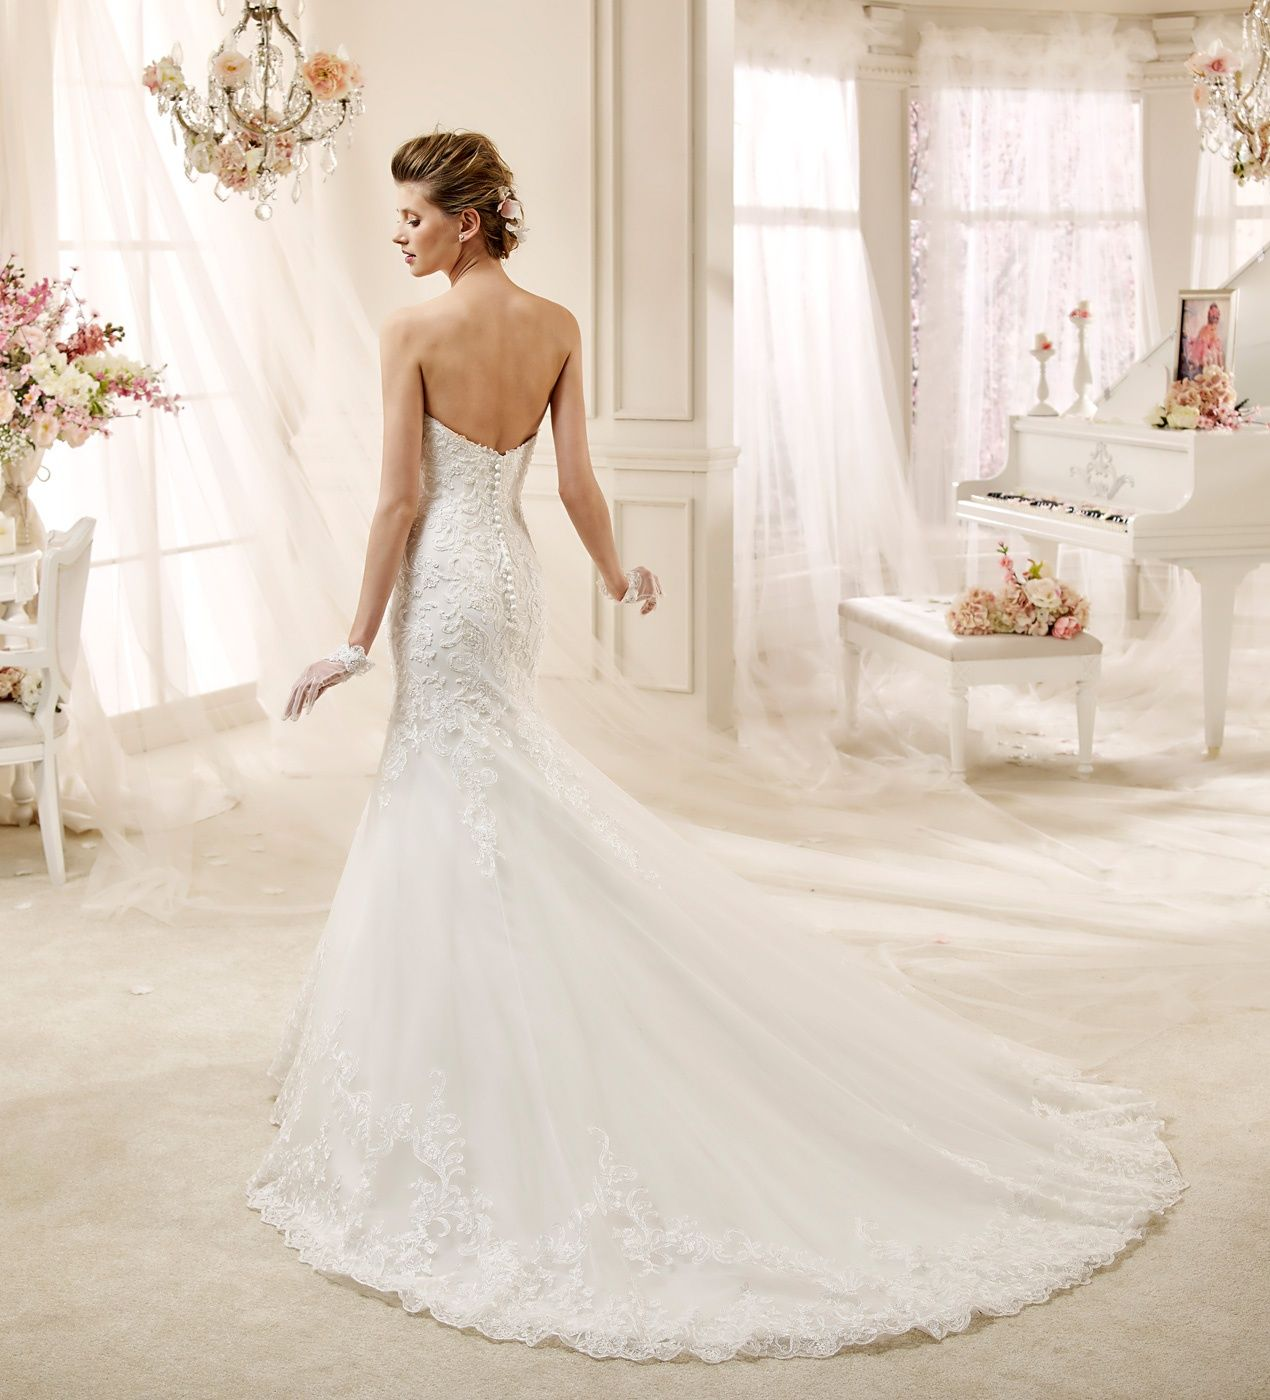 Hayley paige dori wedding dress  Wedding Dress Colet COAB   COLET  Pinterest